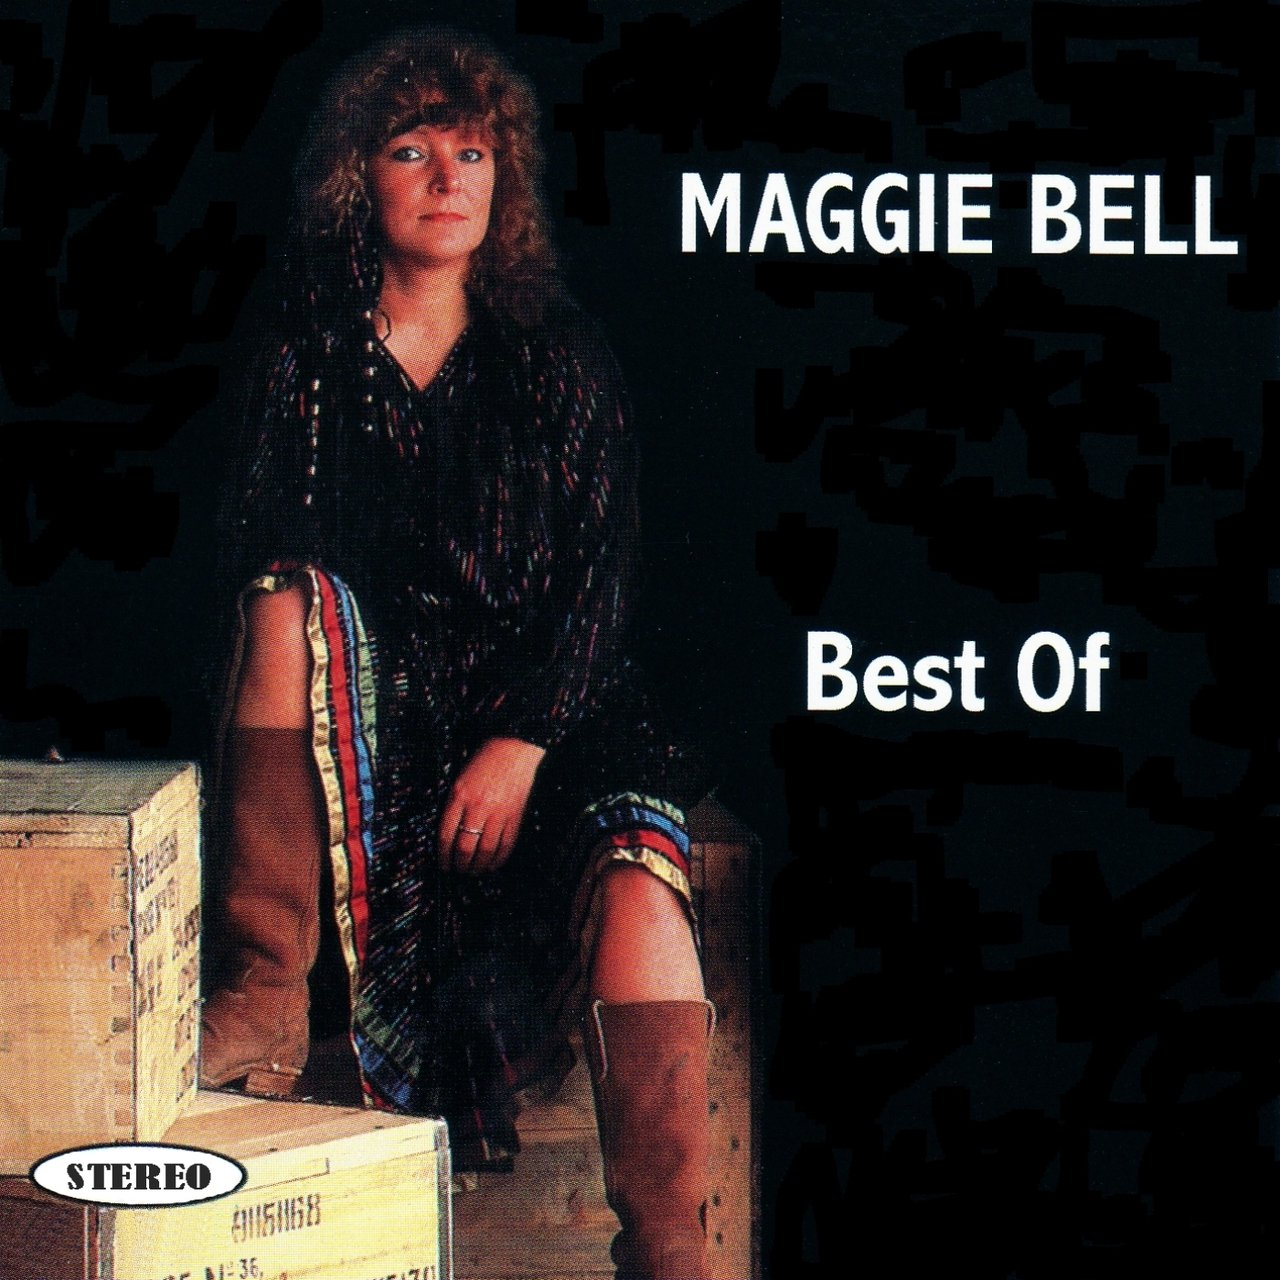 Maggie Bell. Best Of. Sound & Vision (CD+DVD) моррисси morrissey very best of cd dvd